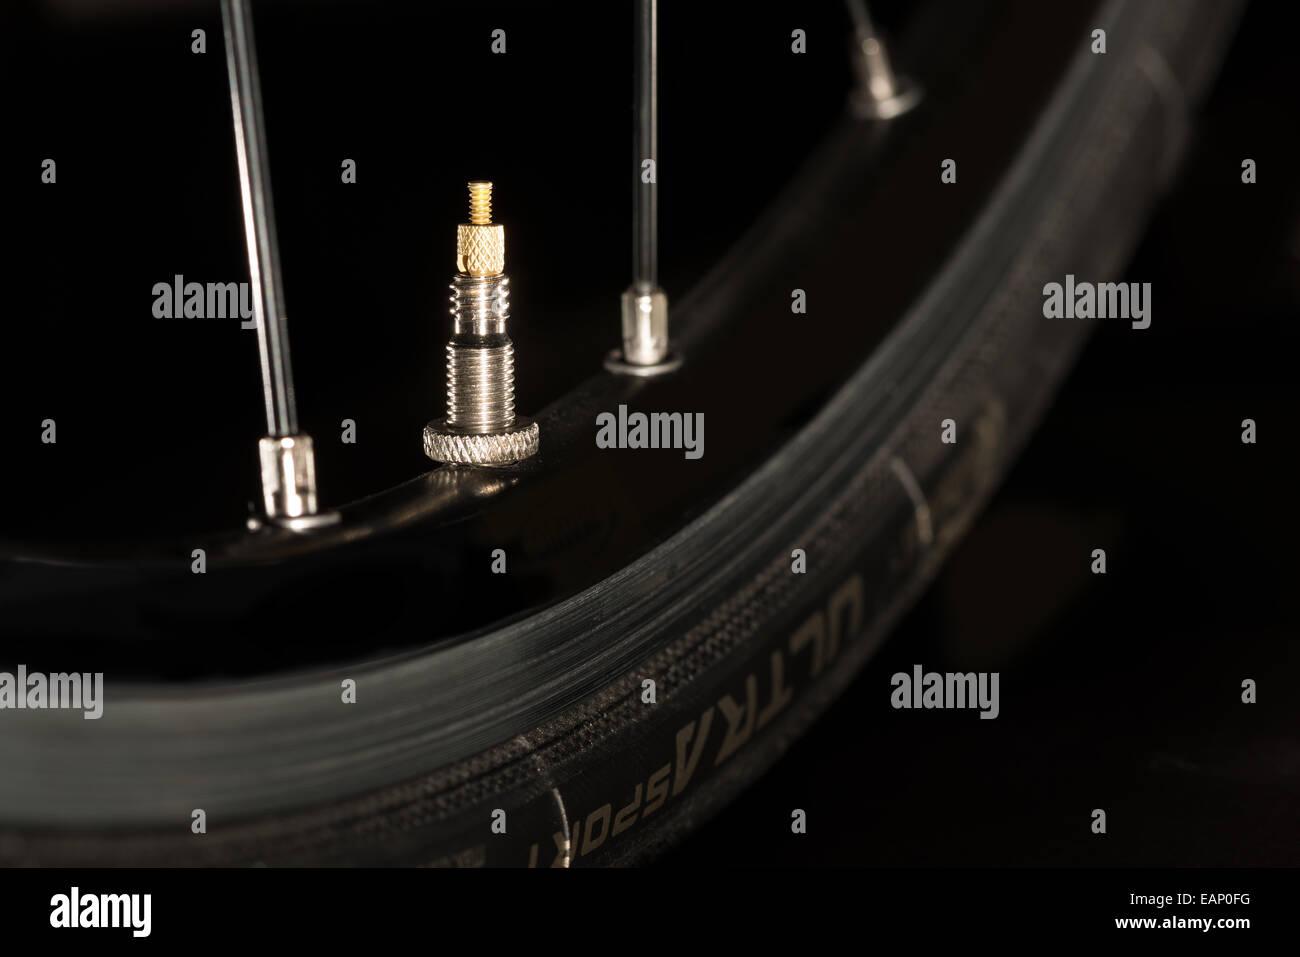 racing road bike wheel rim spokes and valve - Stock Image